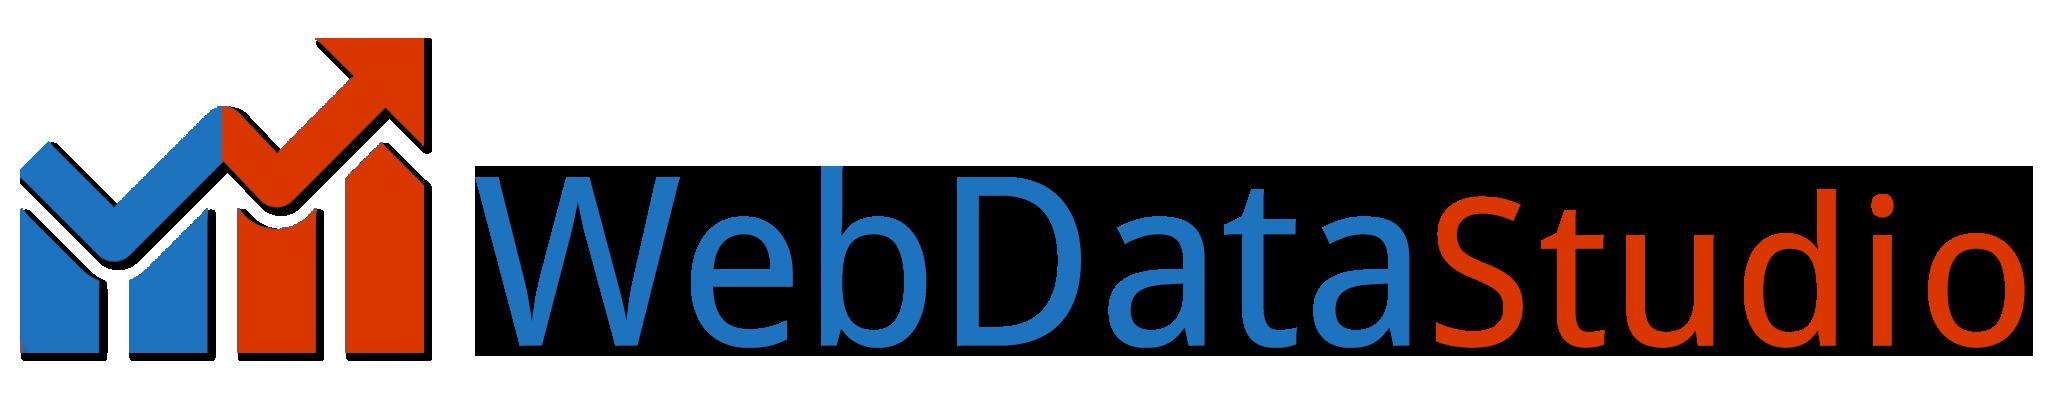 WebDataStudio.com